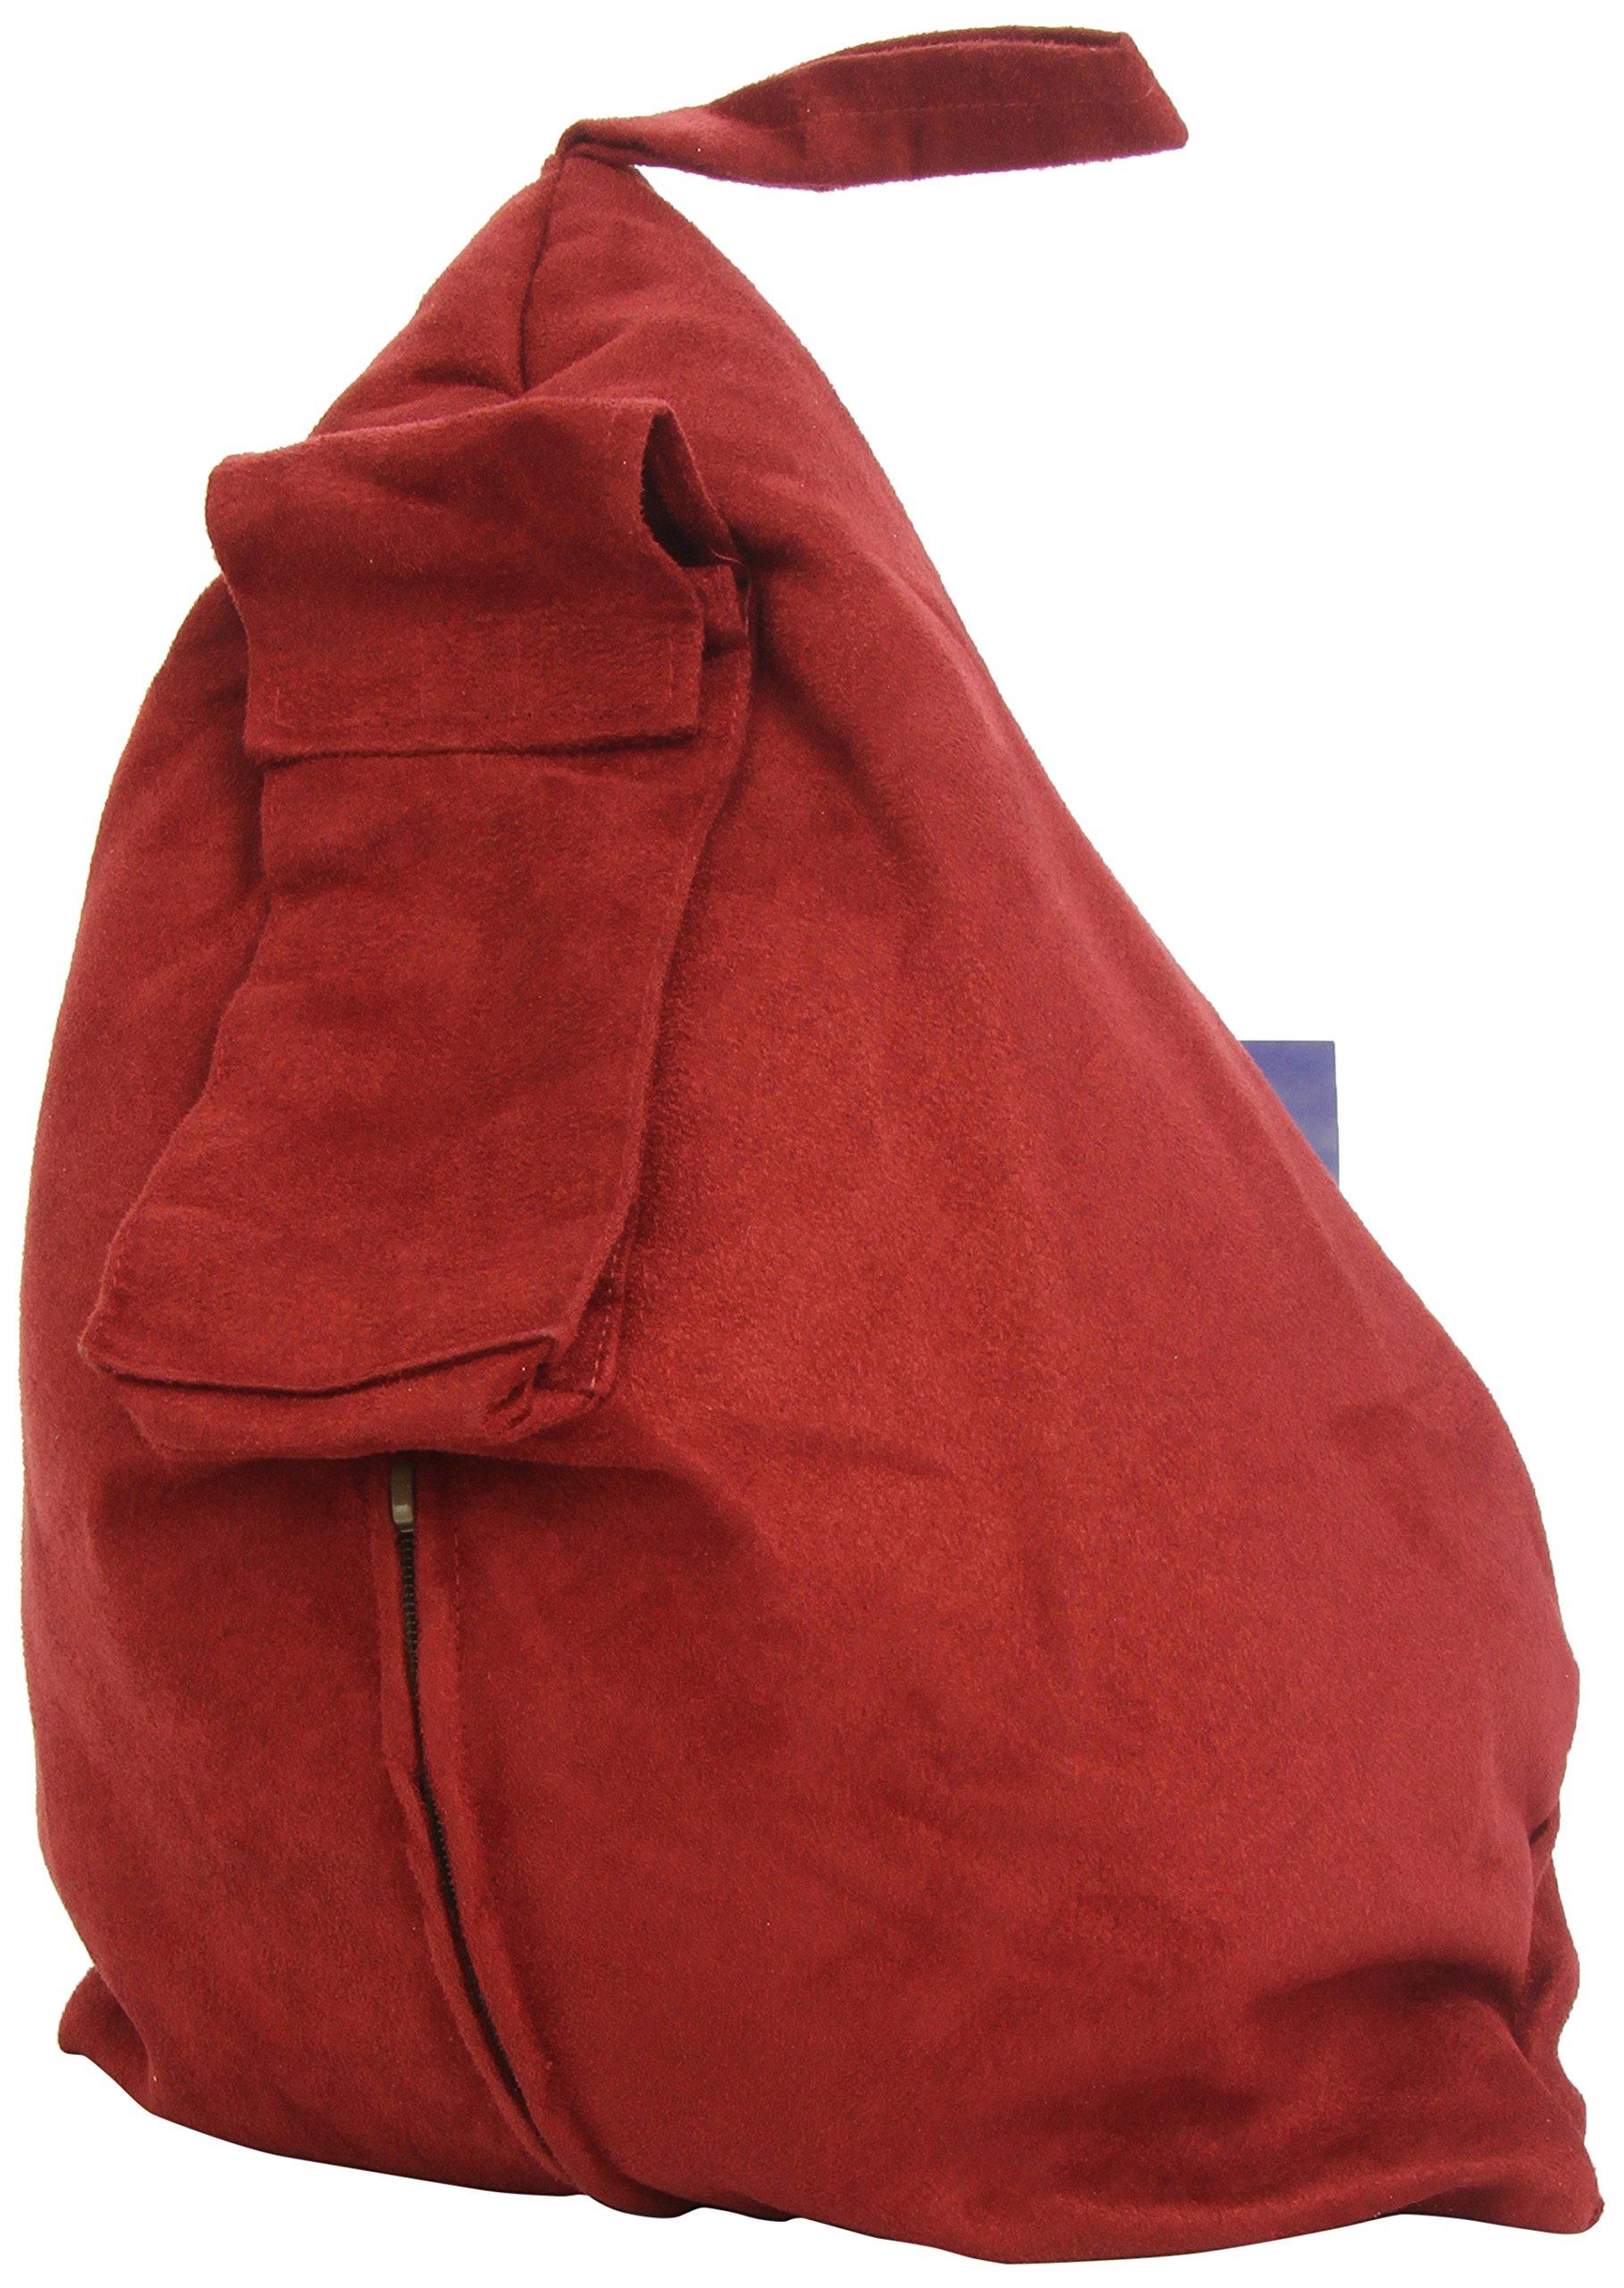 The Book Seat Red/Cinnabar Book/Ipad/E-Reader Holder ...